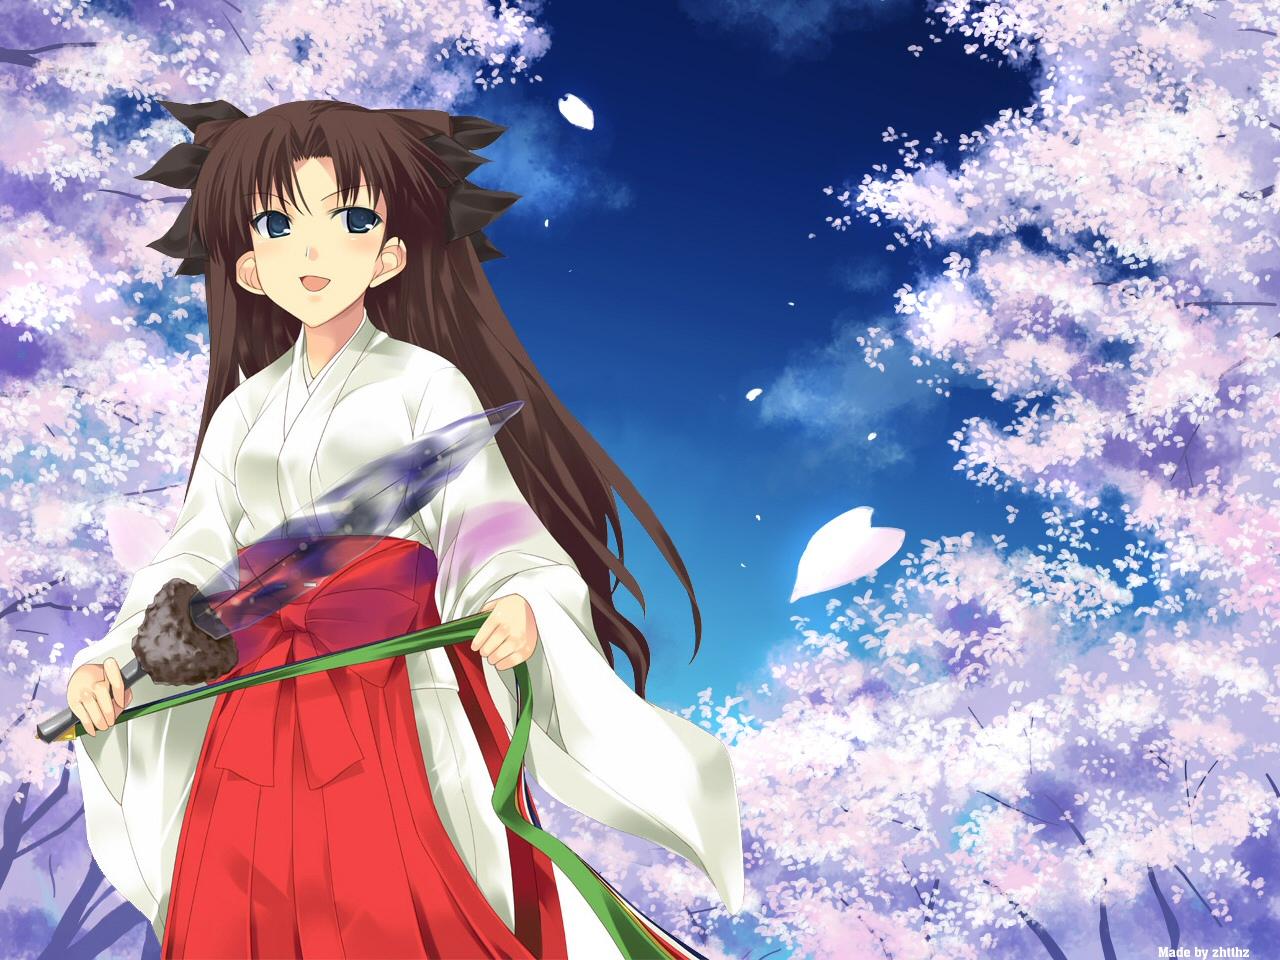 Muryou Anime Wallpaper Fate Stay Night Tousaka Rin 1280x960